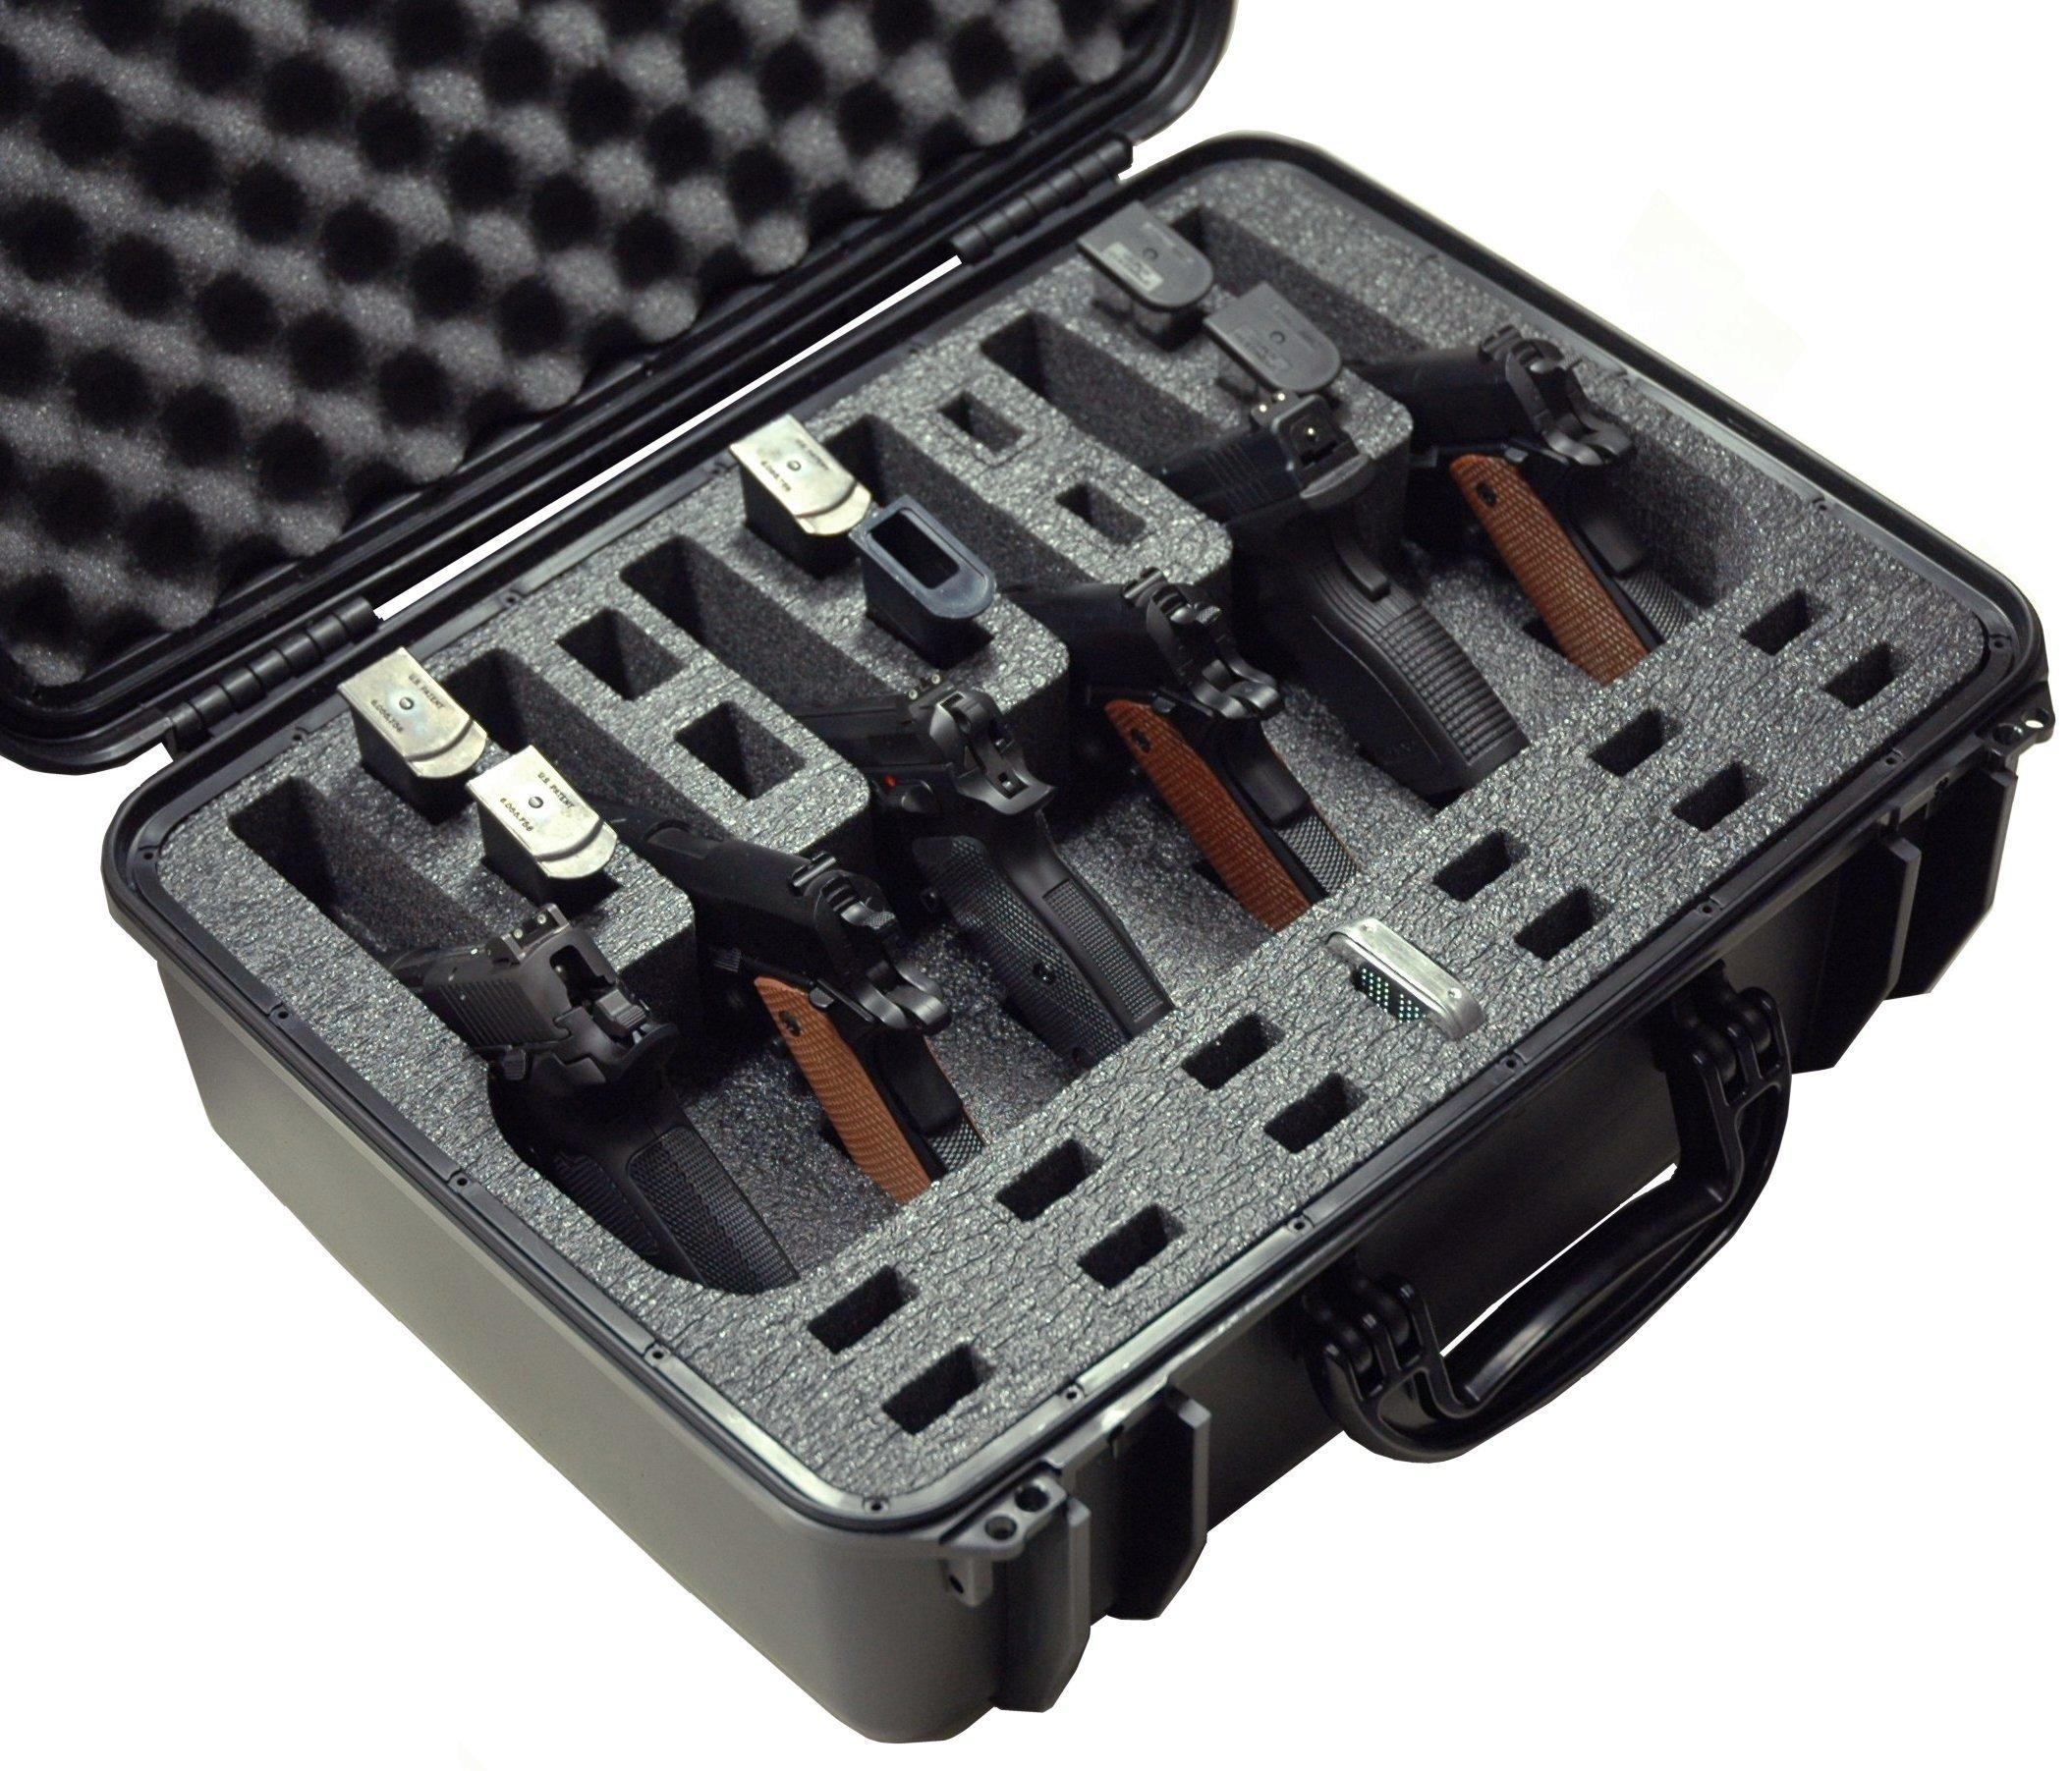 Case Club Waterproof 6 Pistol Case with Silica Gel by Case Club